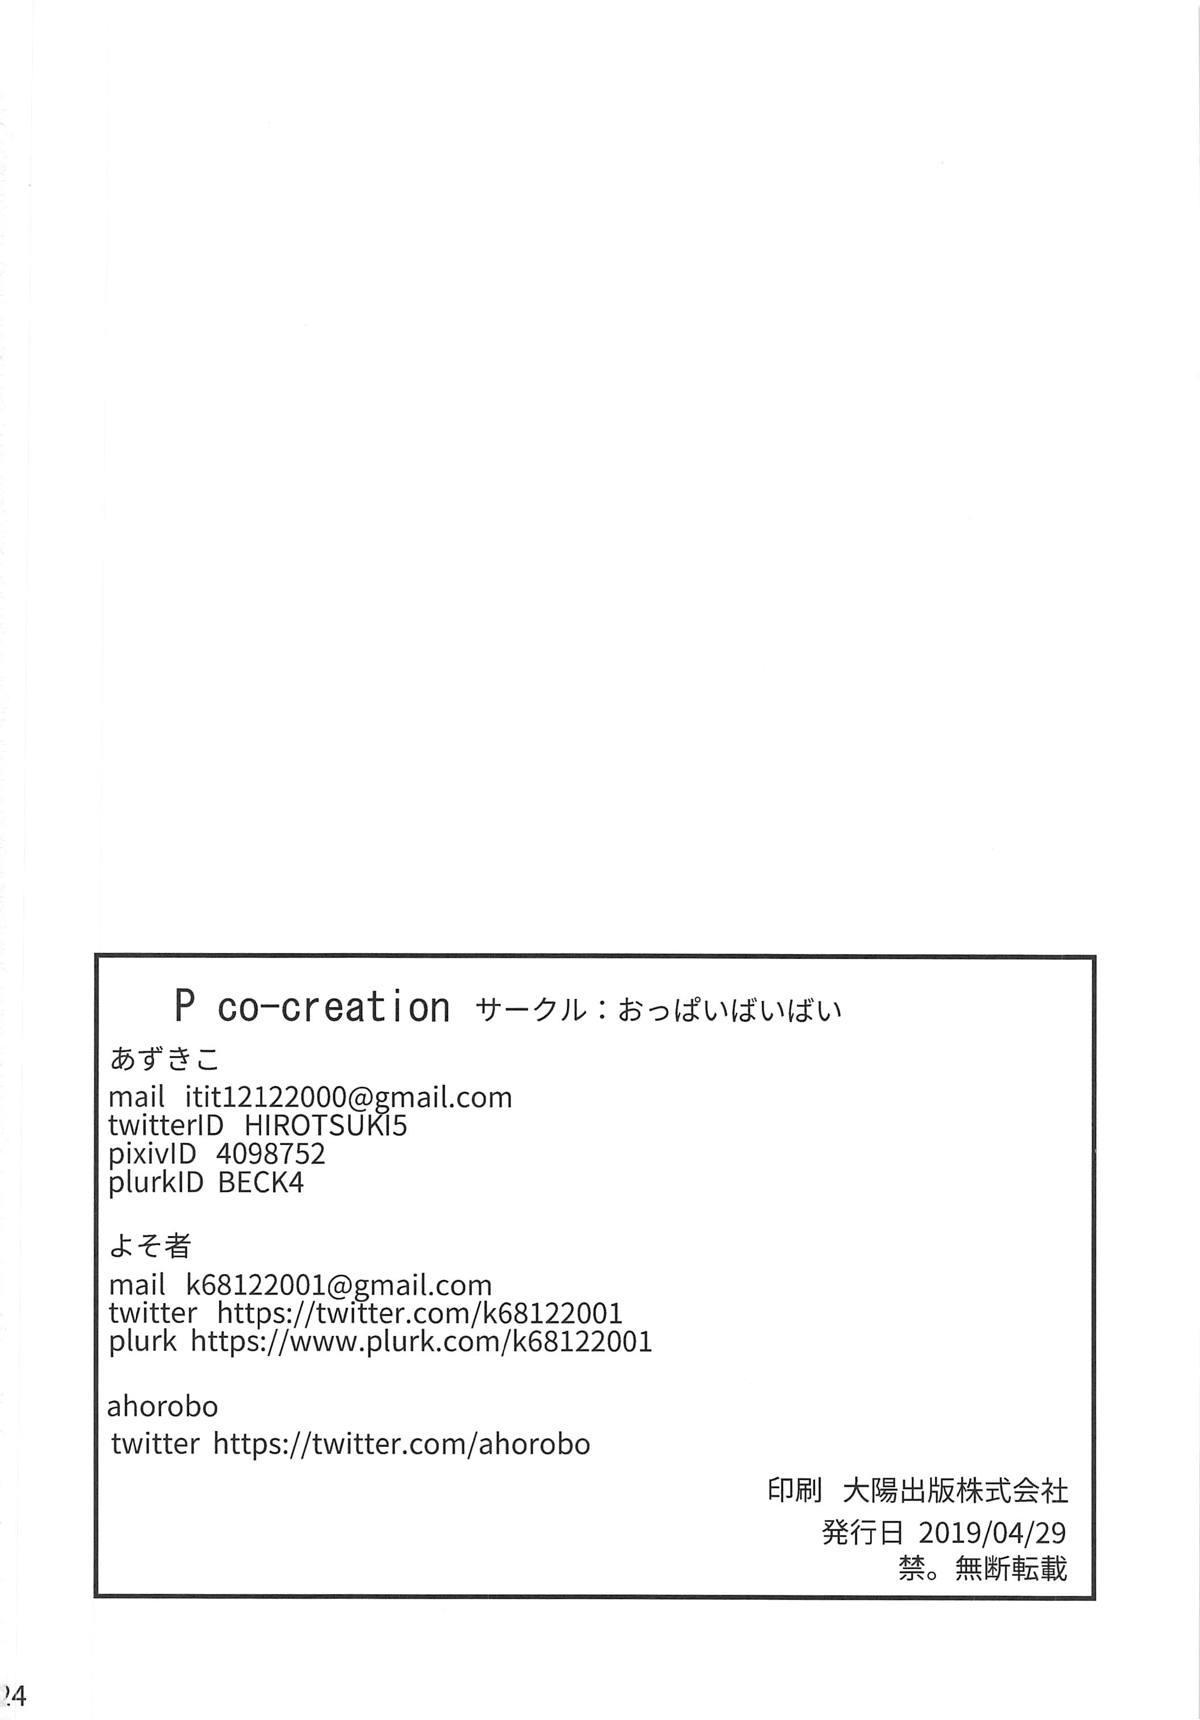 P co-creation 26